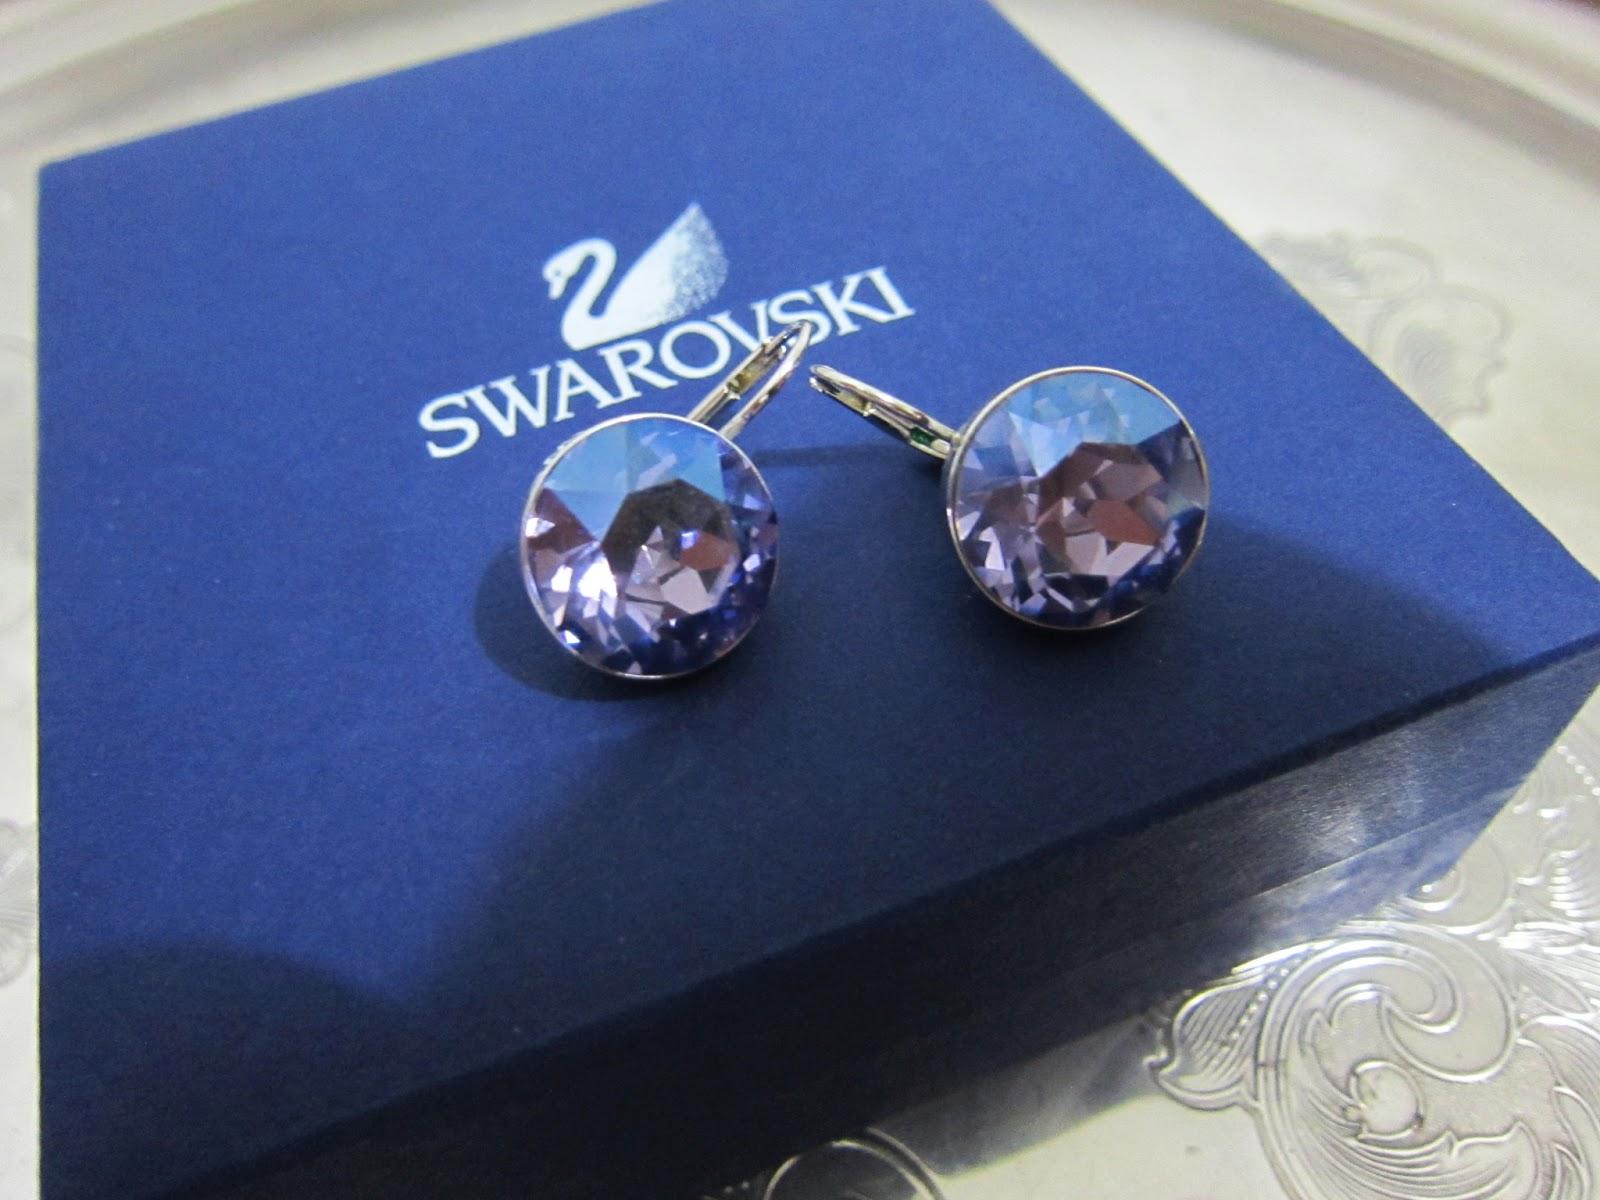 Retired Swarovski Bella Tanzanite Moonlight Earrings